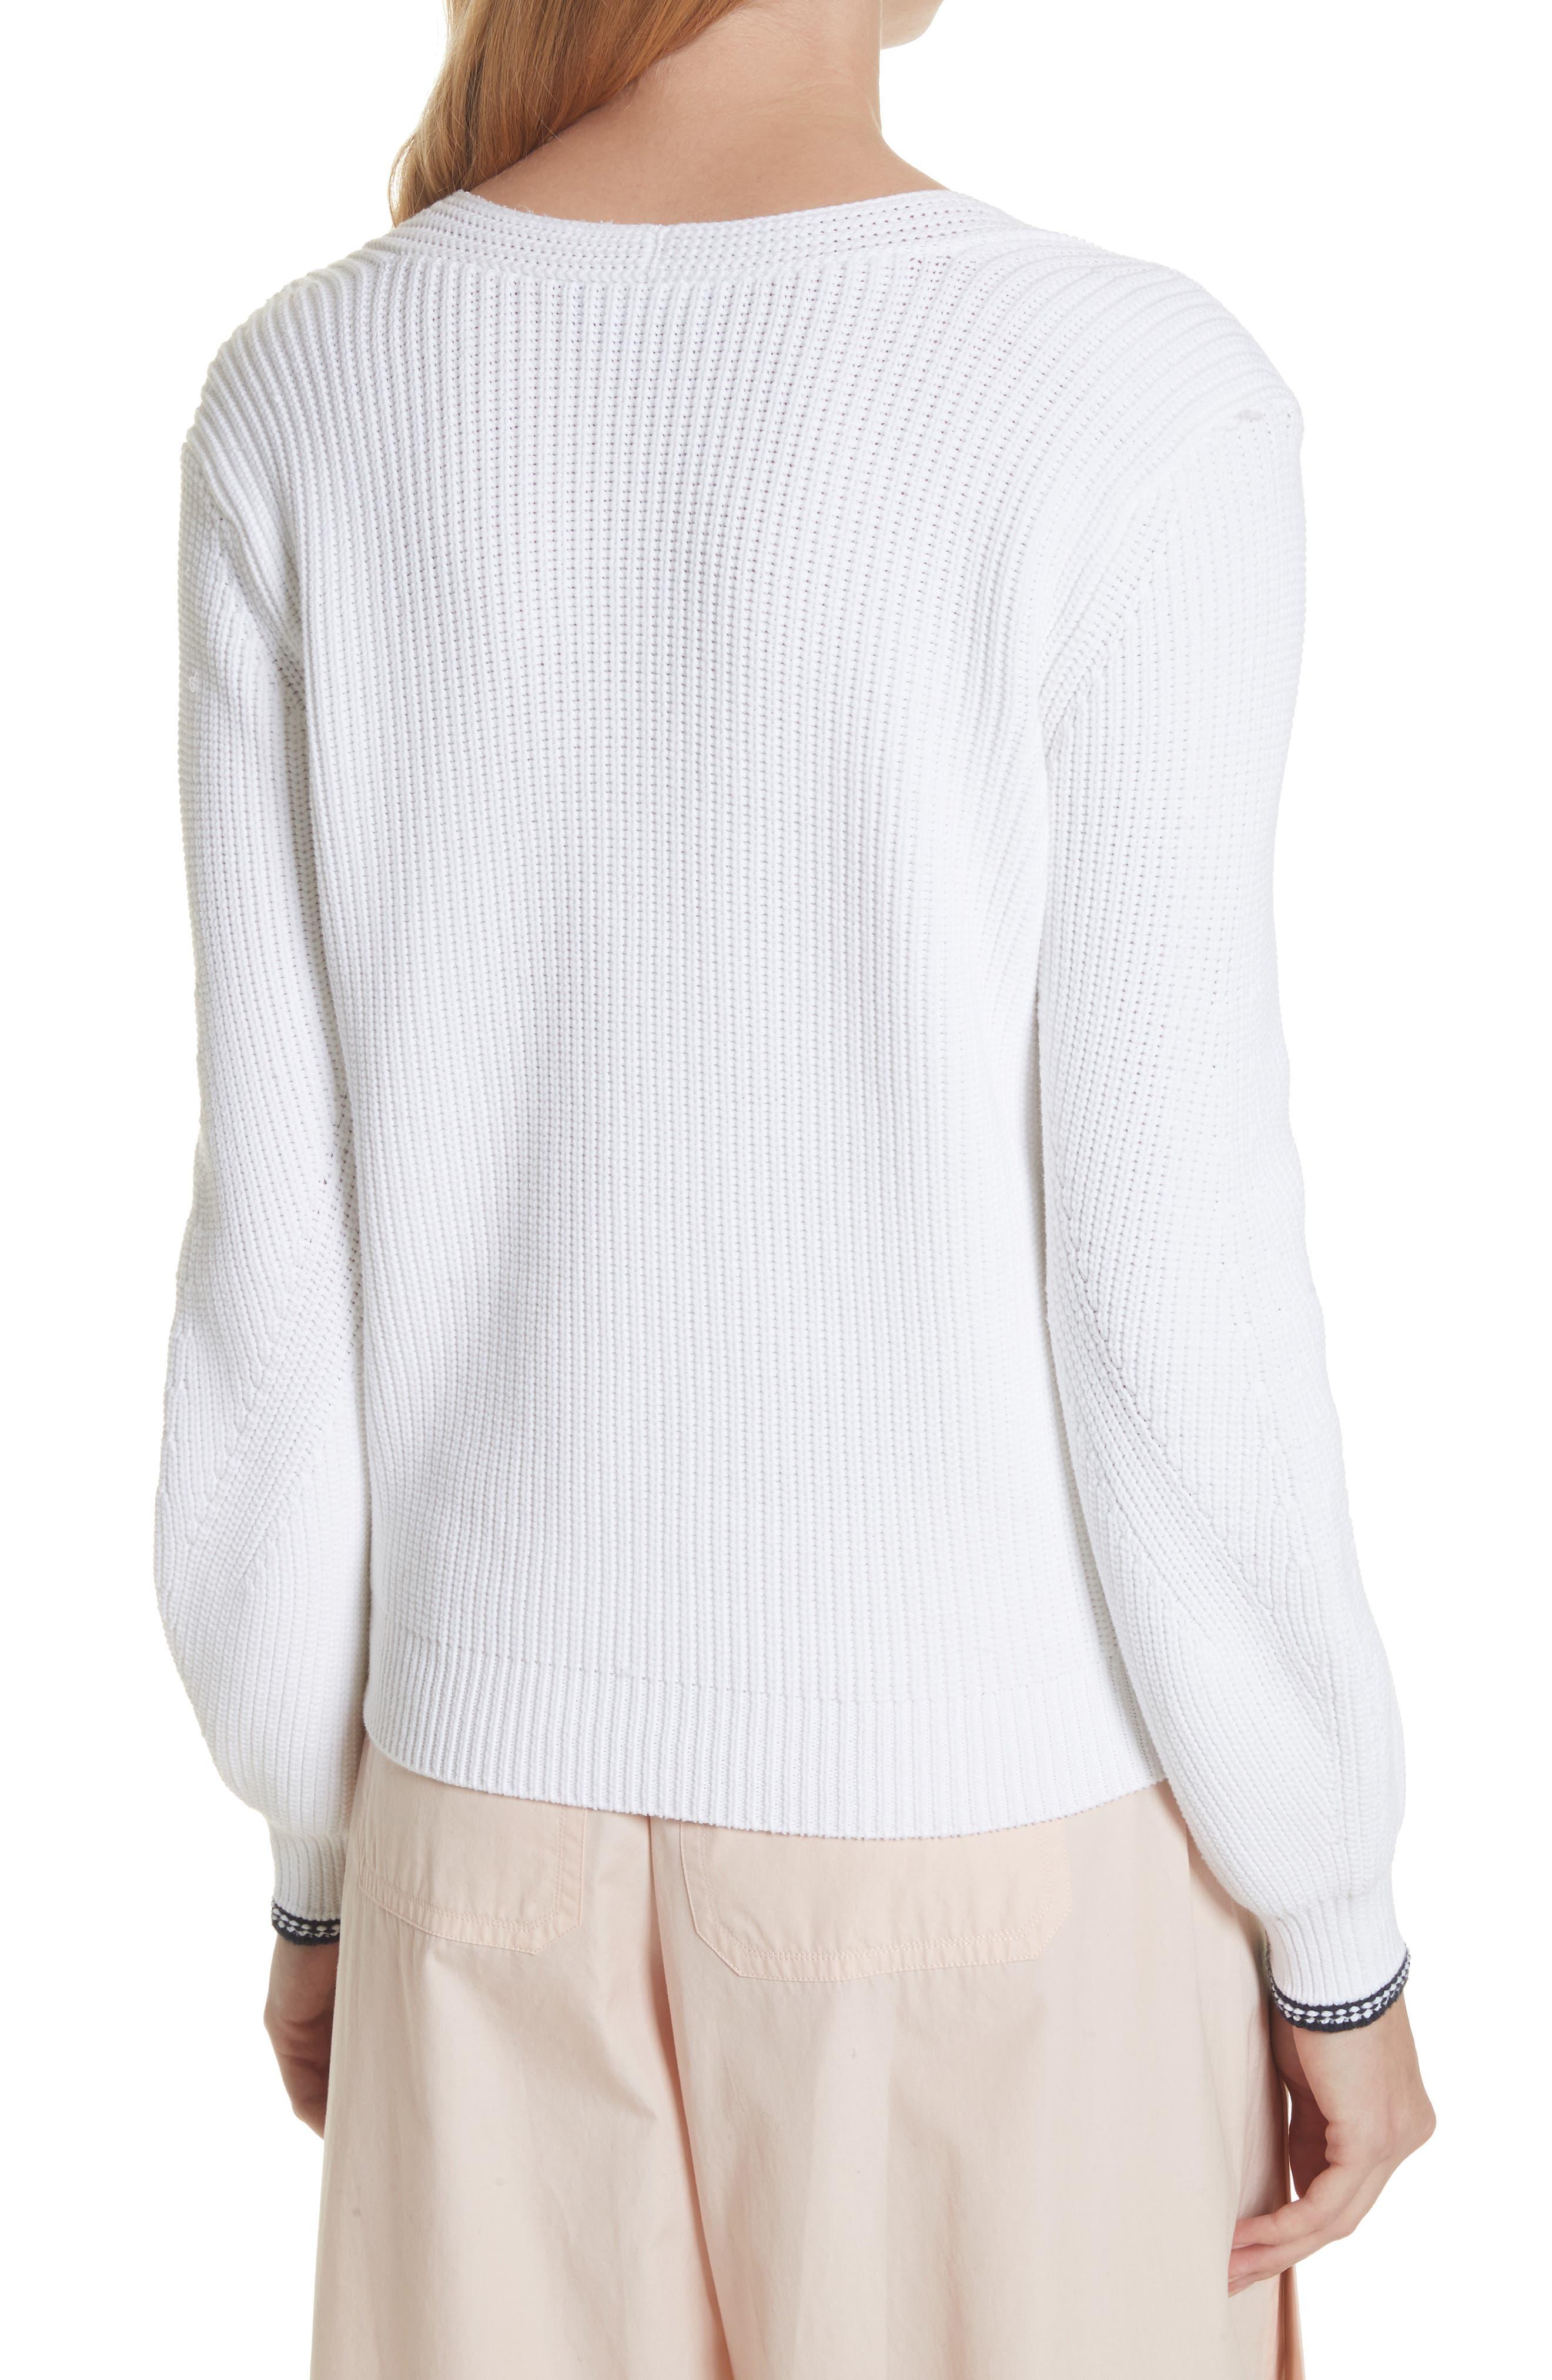 Bishop Sleeve Sweater,                             Alternate thumbnail 2, color,                             Optic White/ Coastal